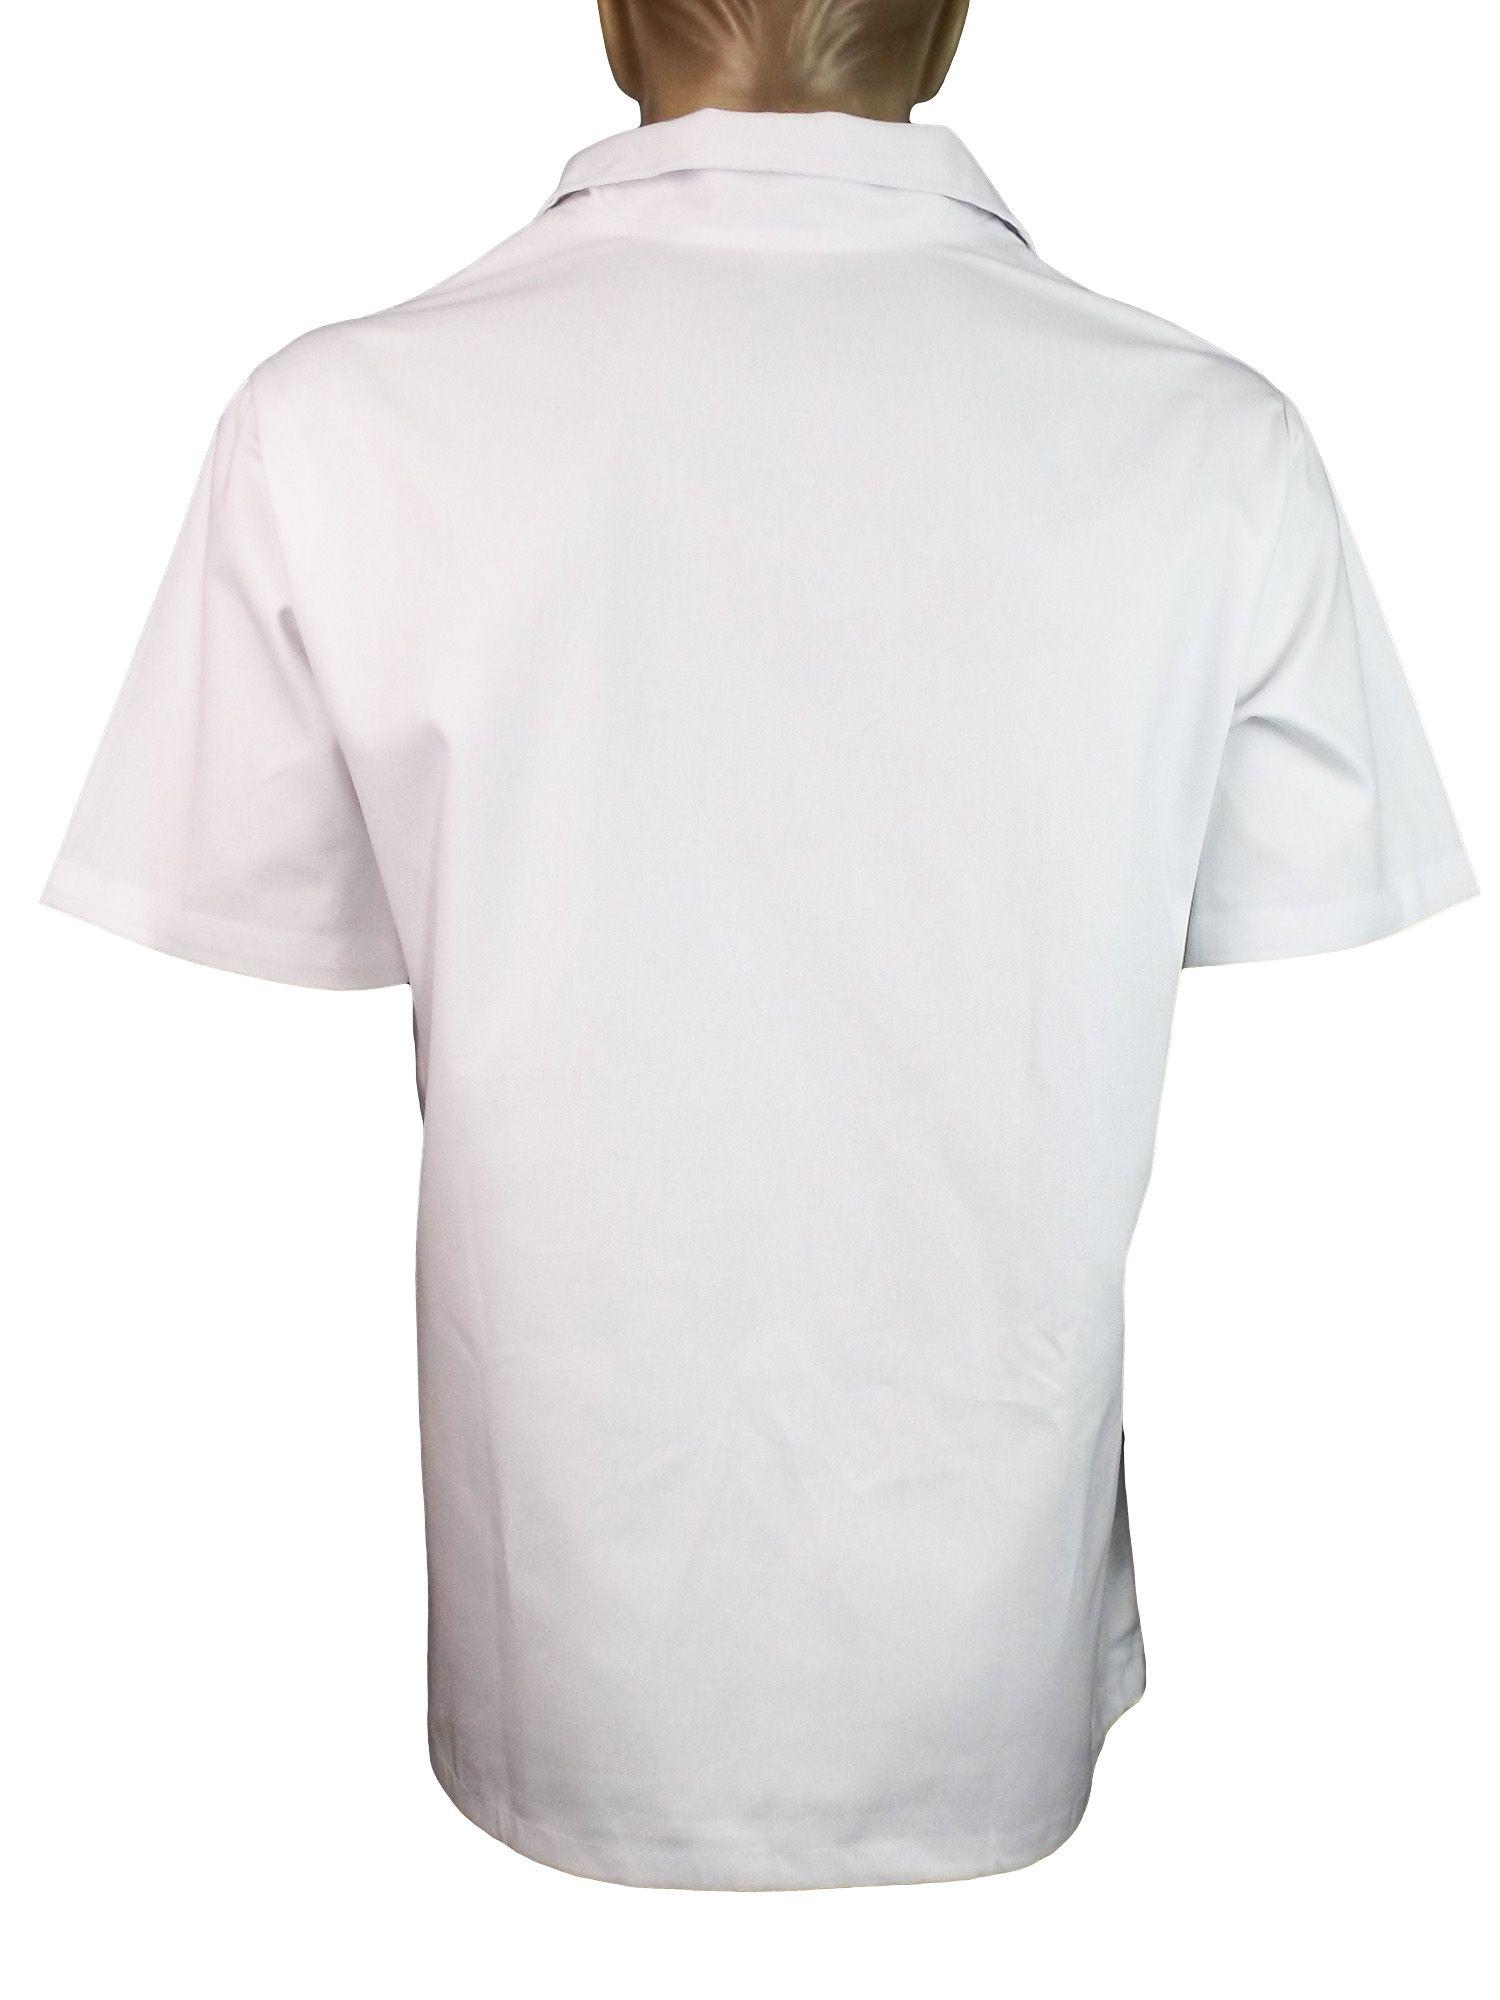 10a945ffdea4d Camisa Gola Italiana Manga Curta em Brim Profissional Branco - Dr ...